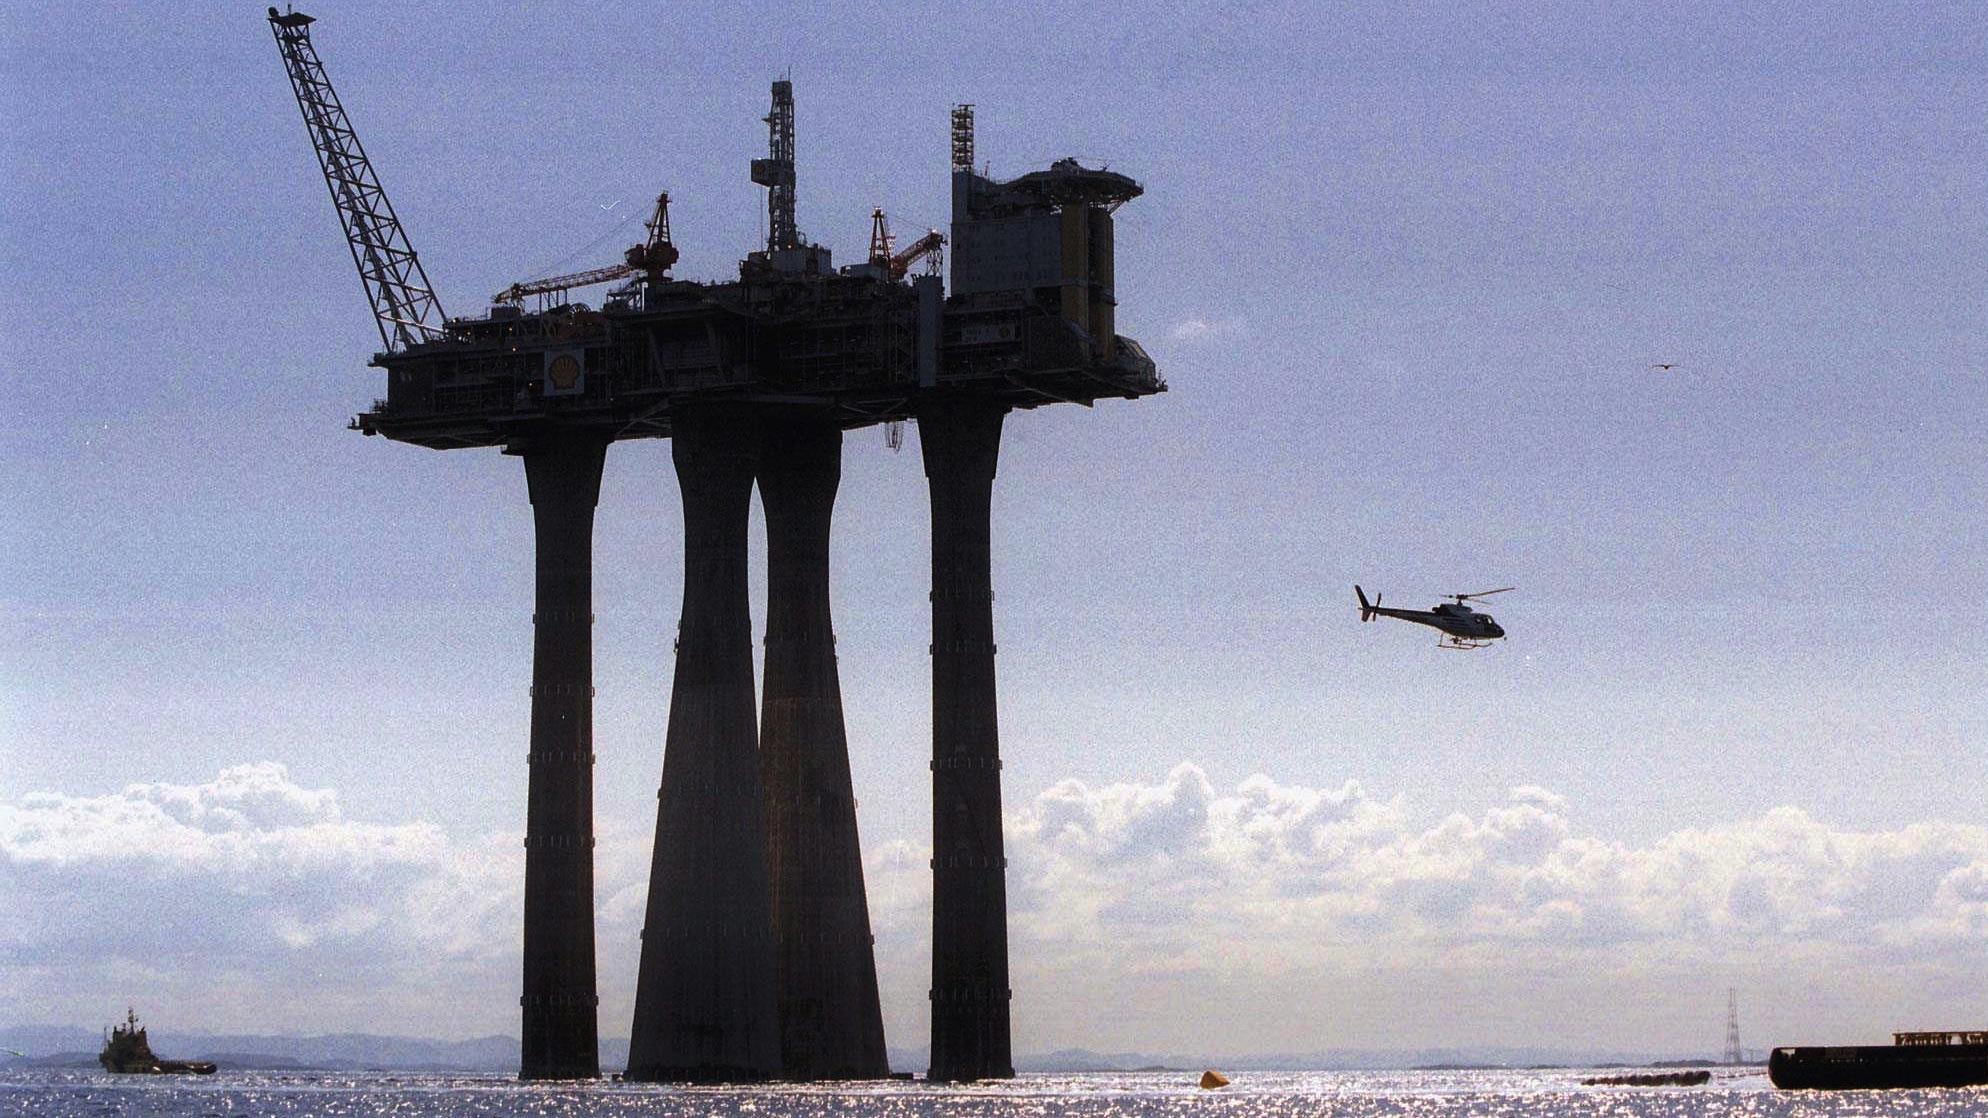 Norway's Troll gas platform.